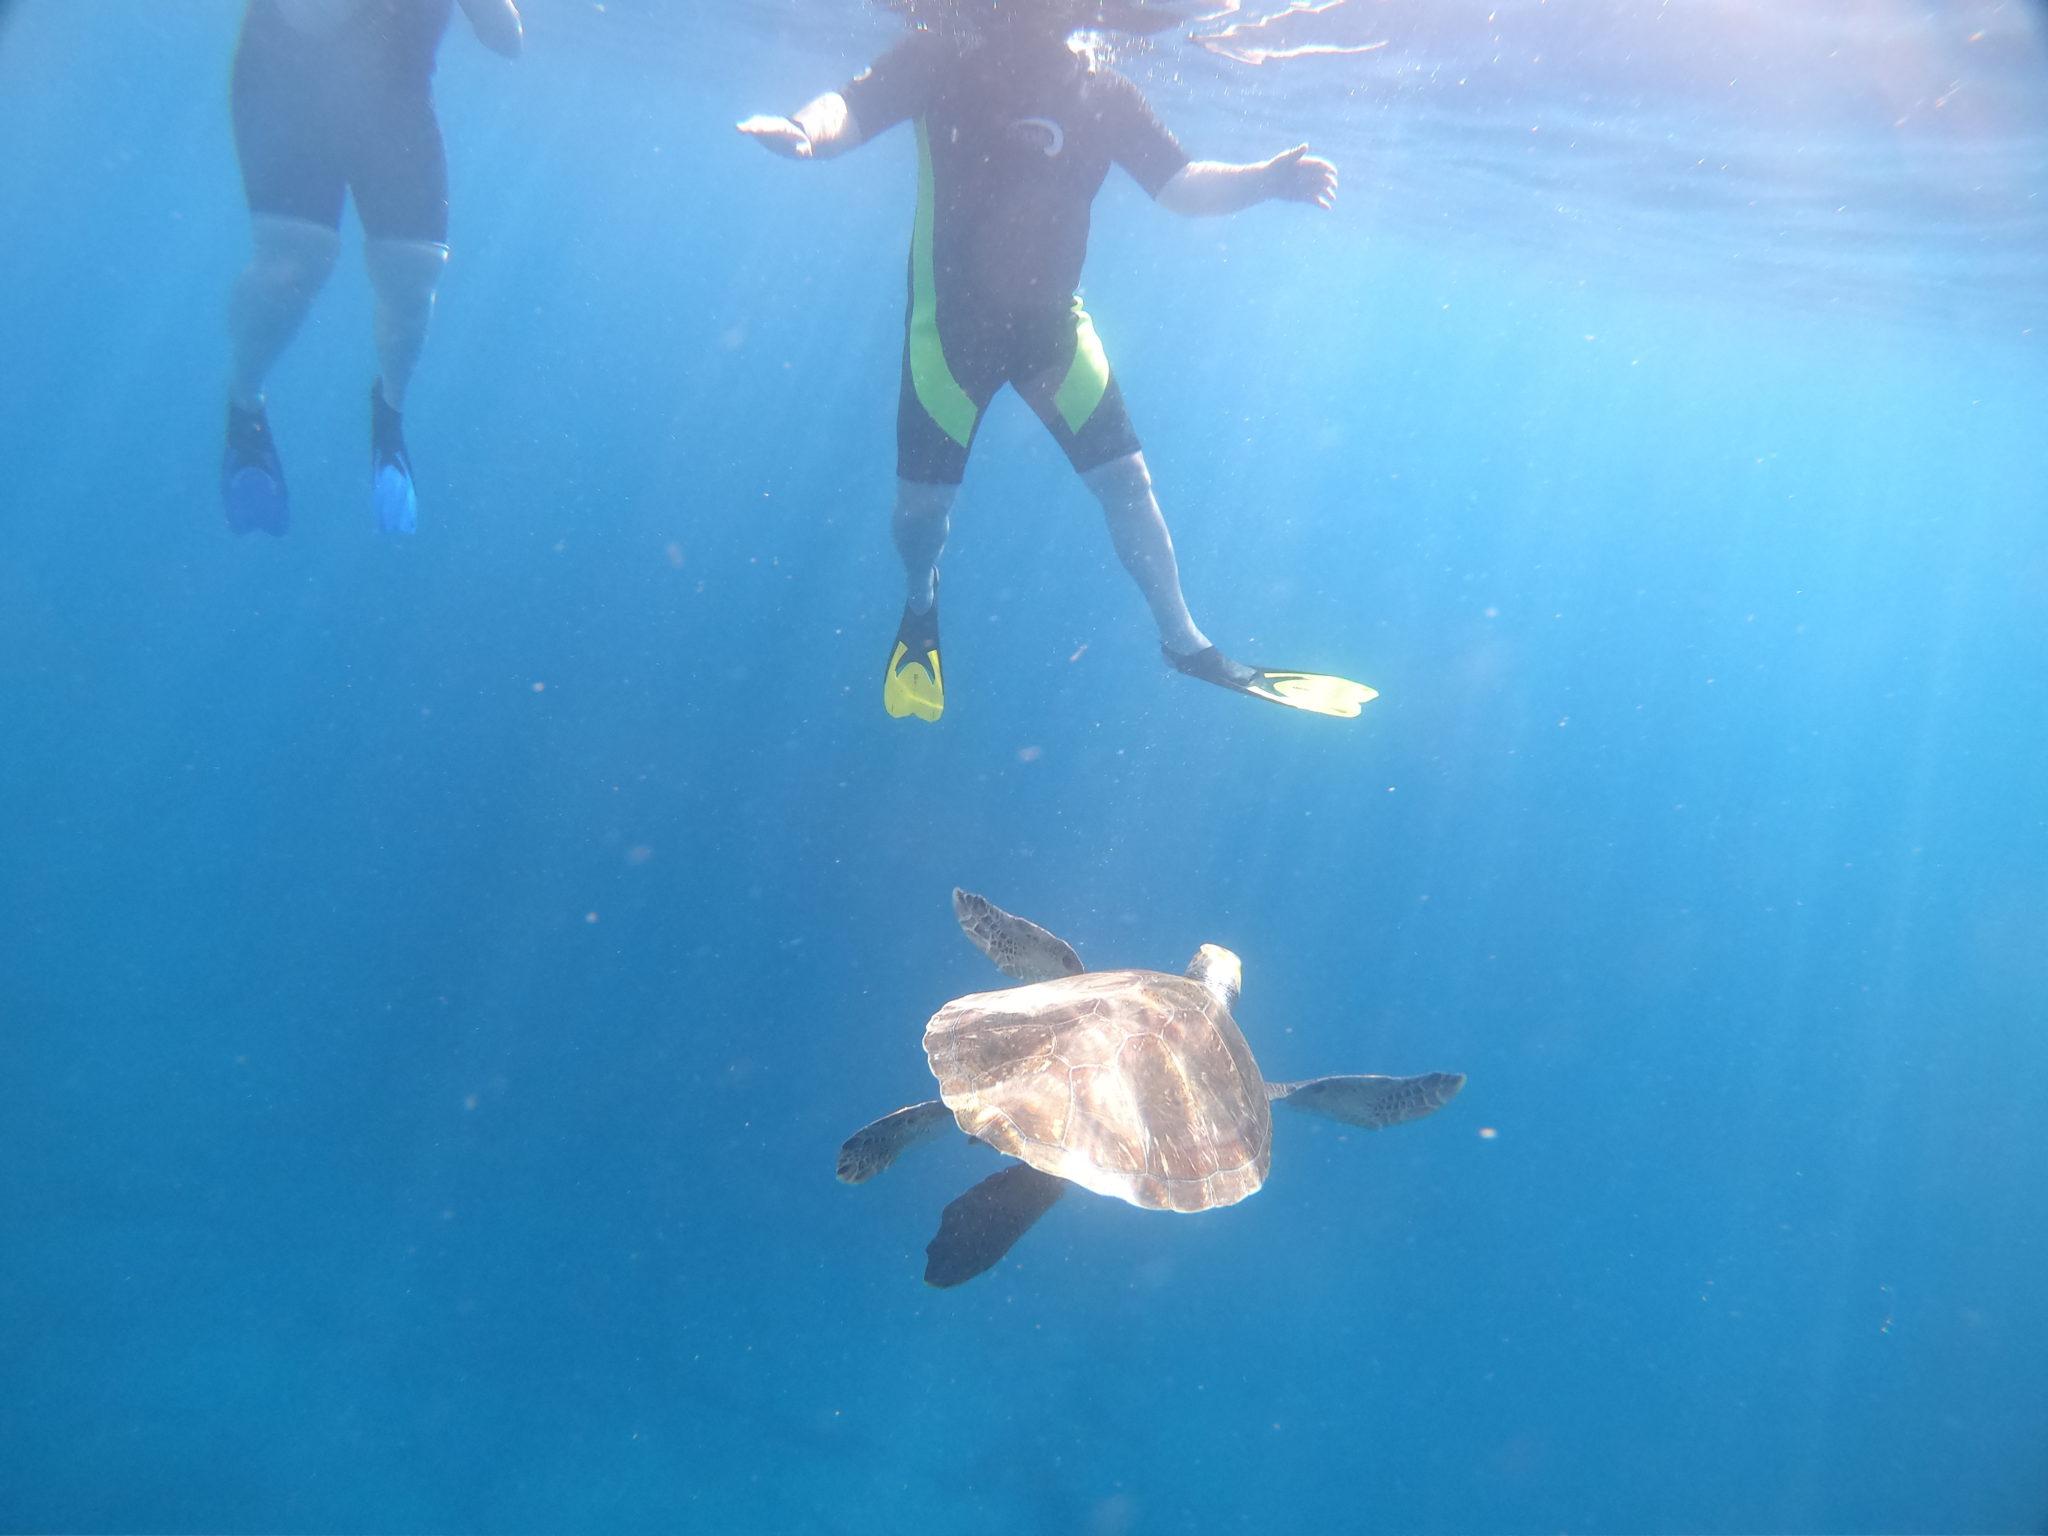 Tenerife turtle snorkeling experience: Costa Adeje boat trip